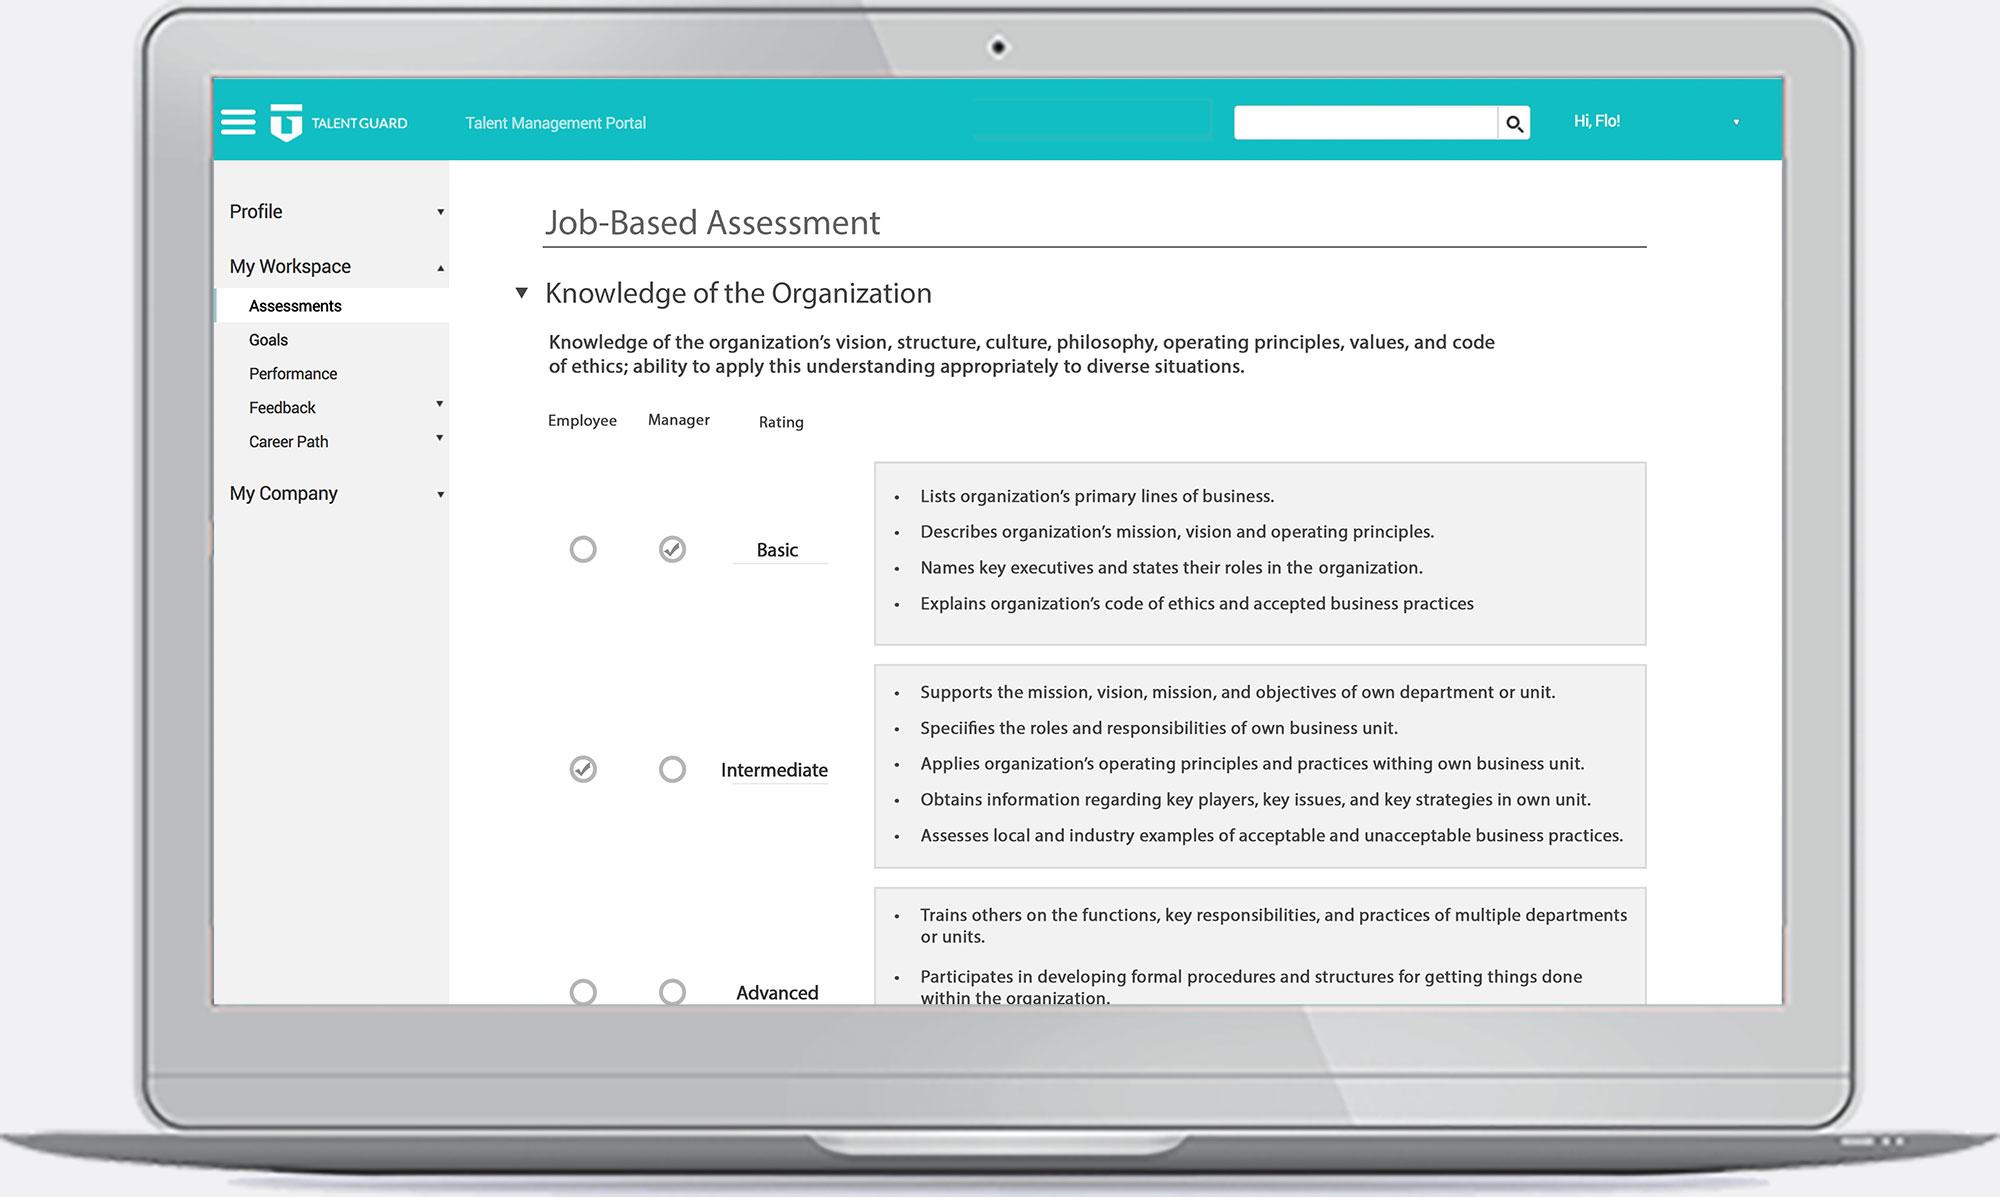 Performance Management - Job-Based Assessment